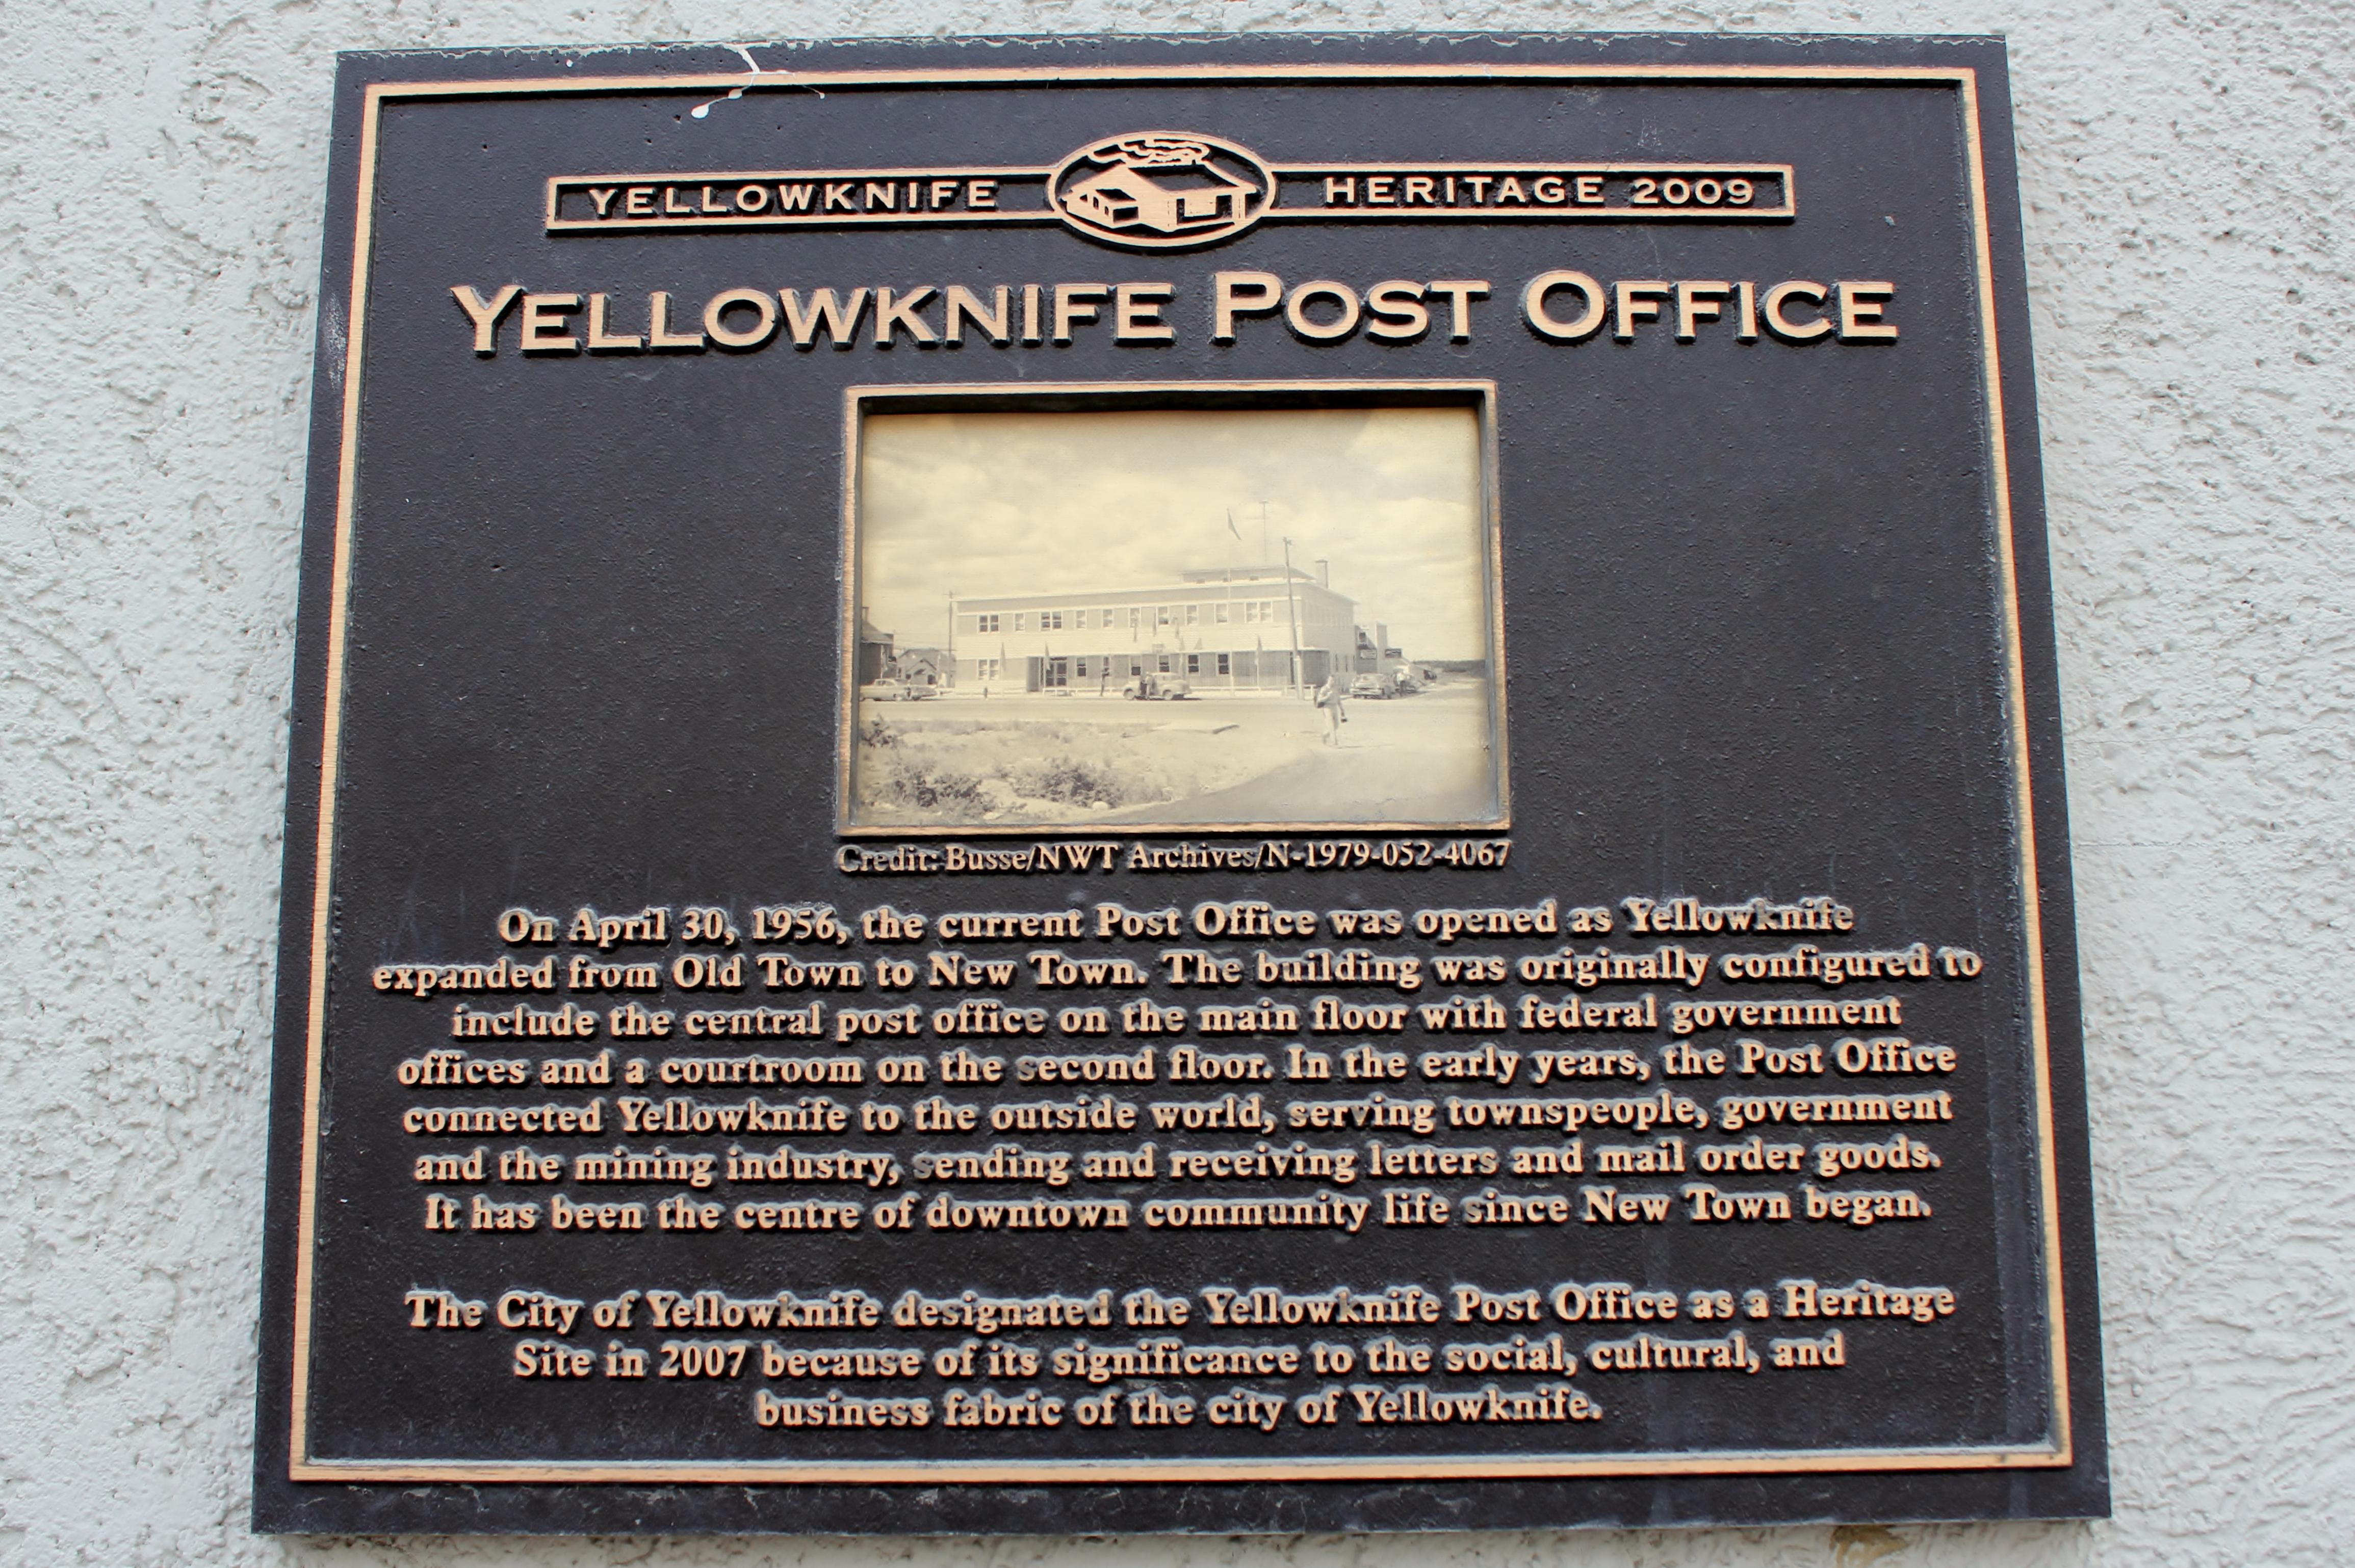 File:Yellowknife Post Office (plaque).JPG